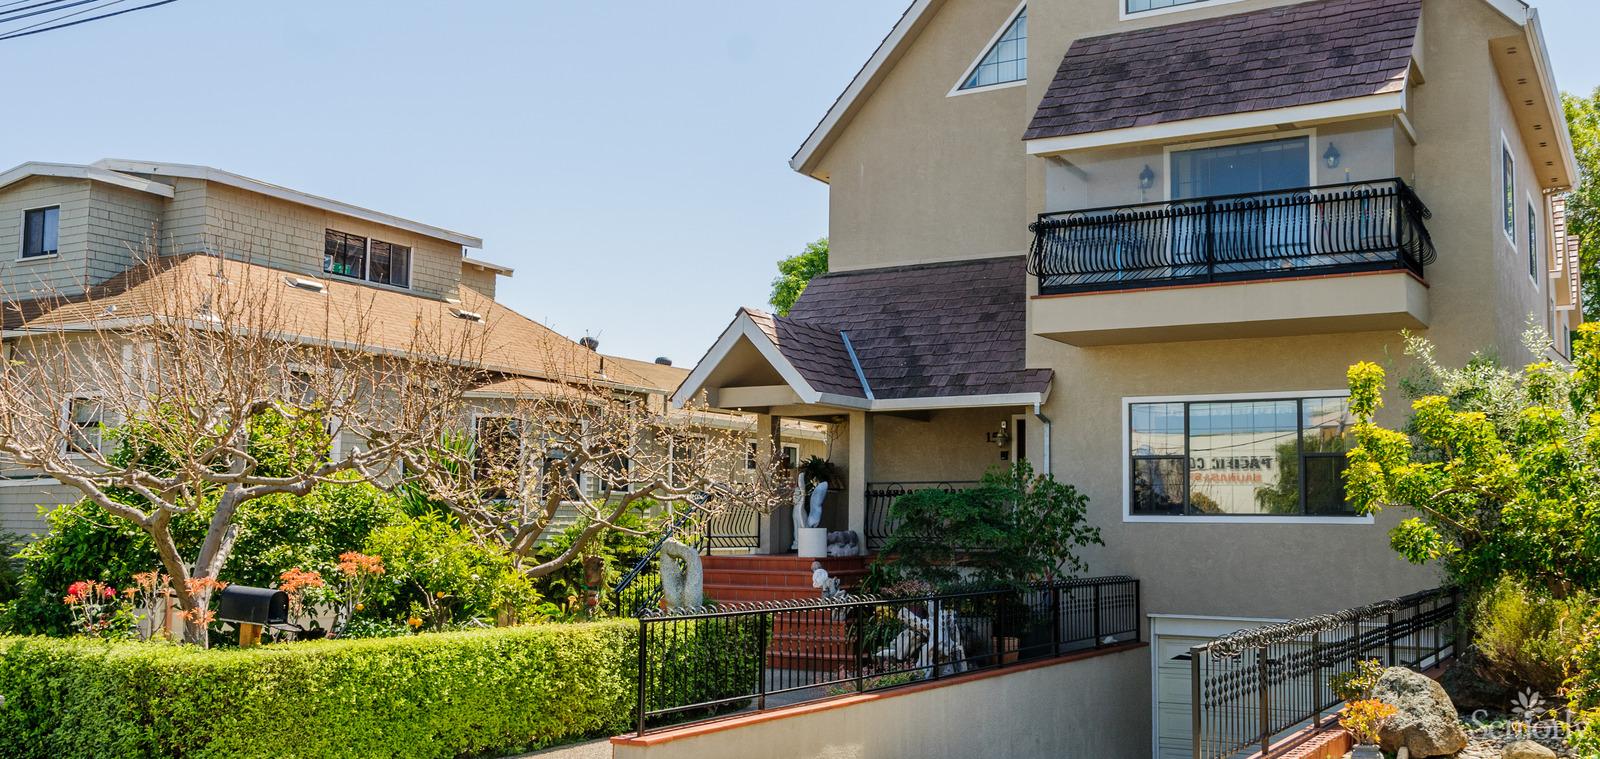 B&B Residential Facilities (15 W) San Mateo CA 4